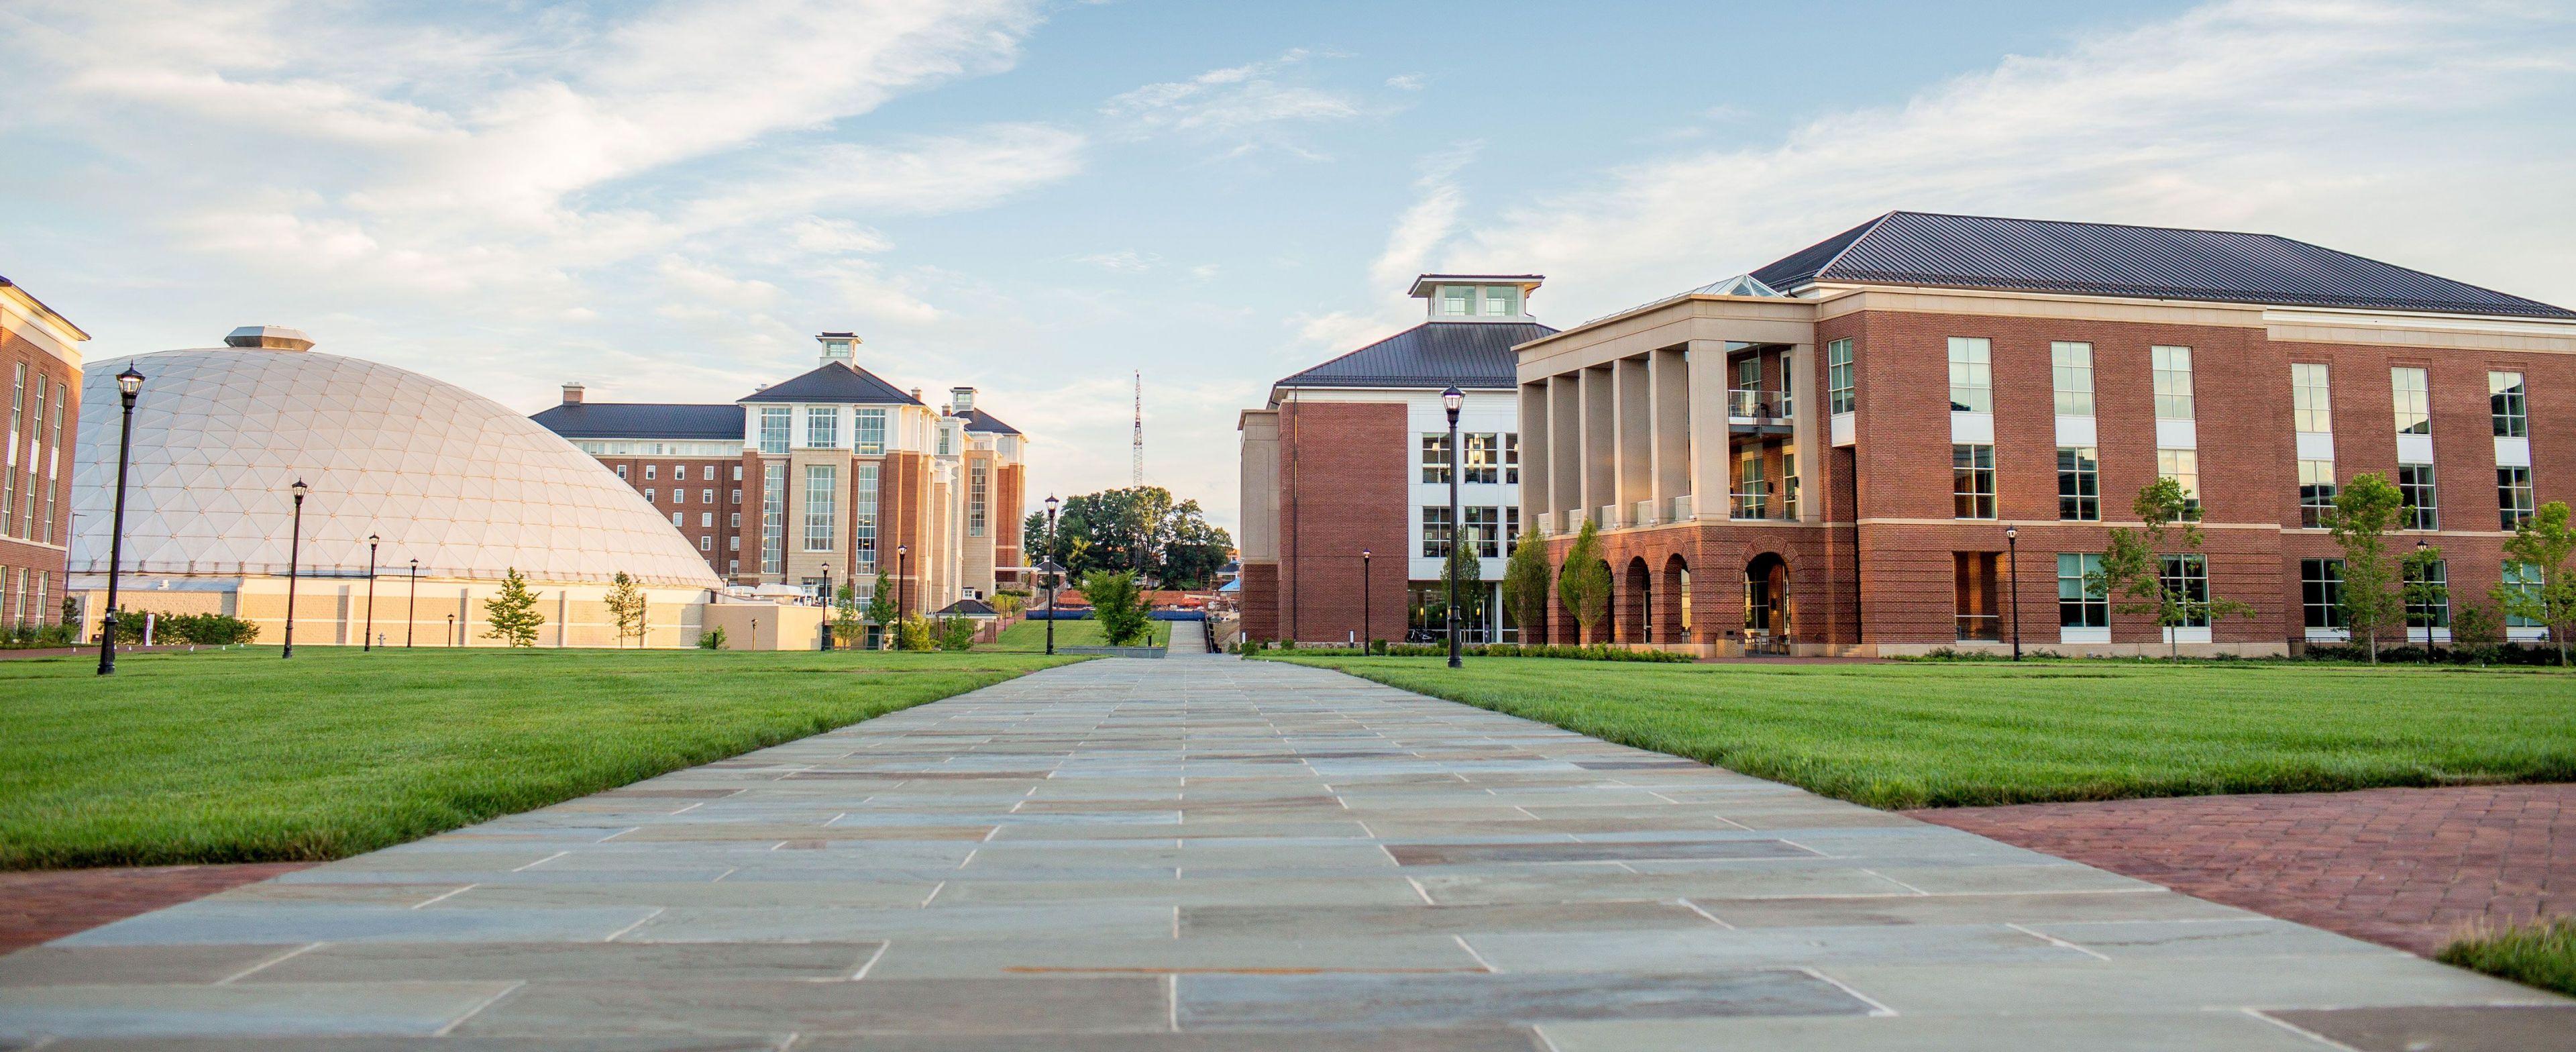 Intensives Enrollment Information Online Degree Program